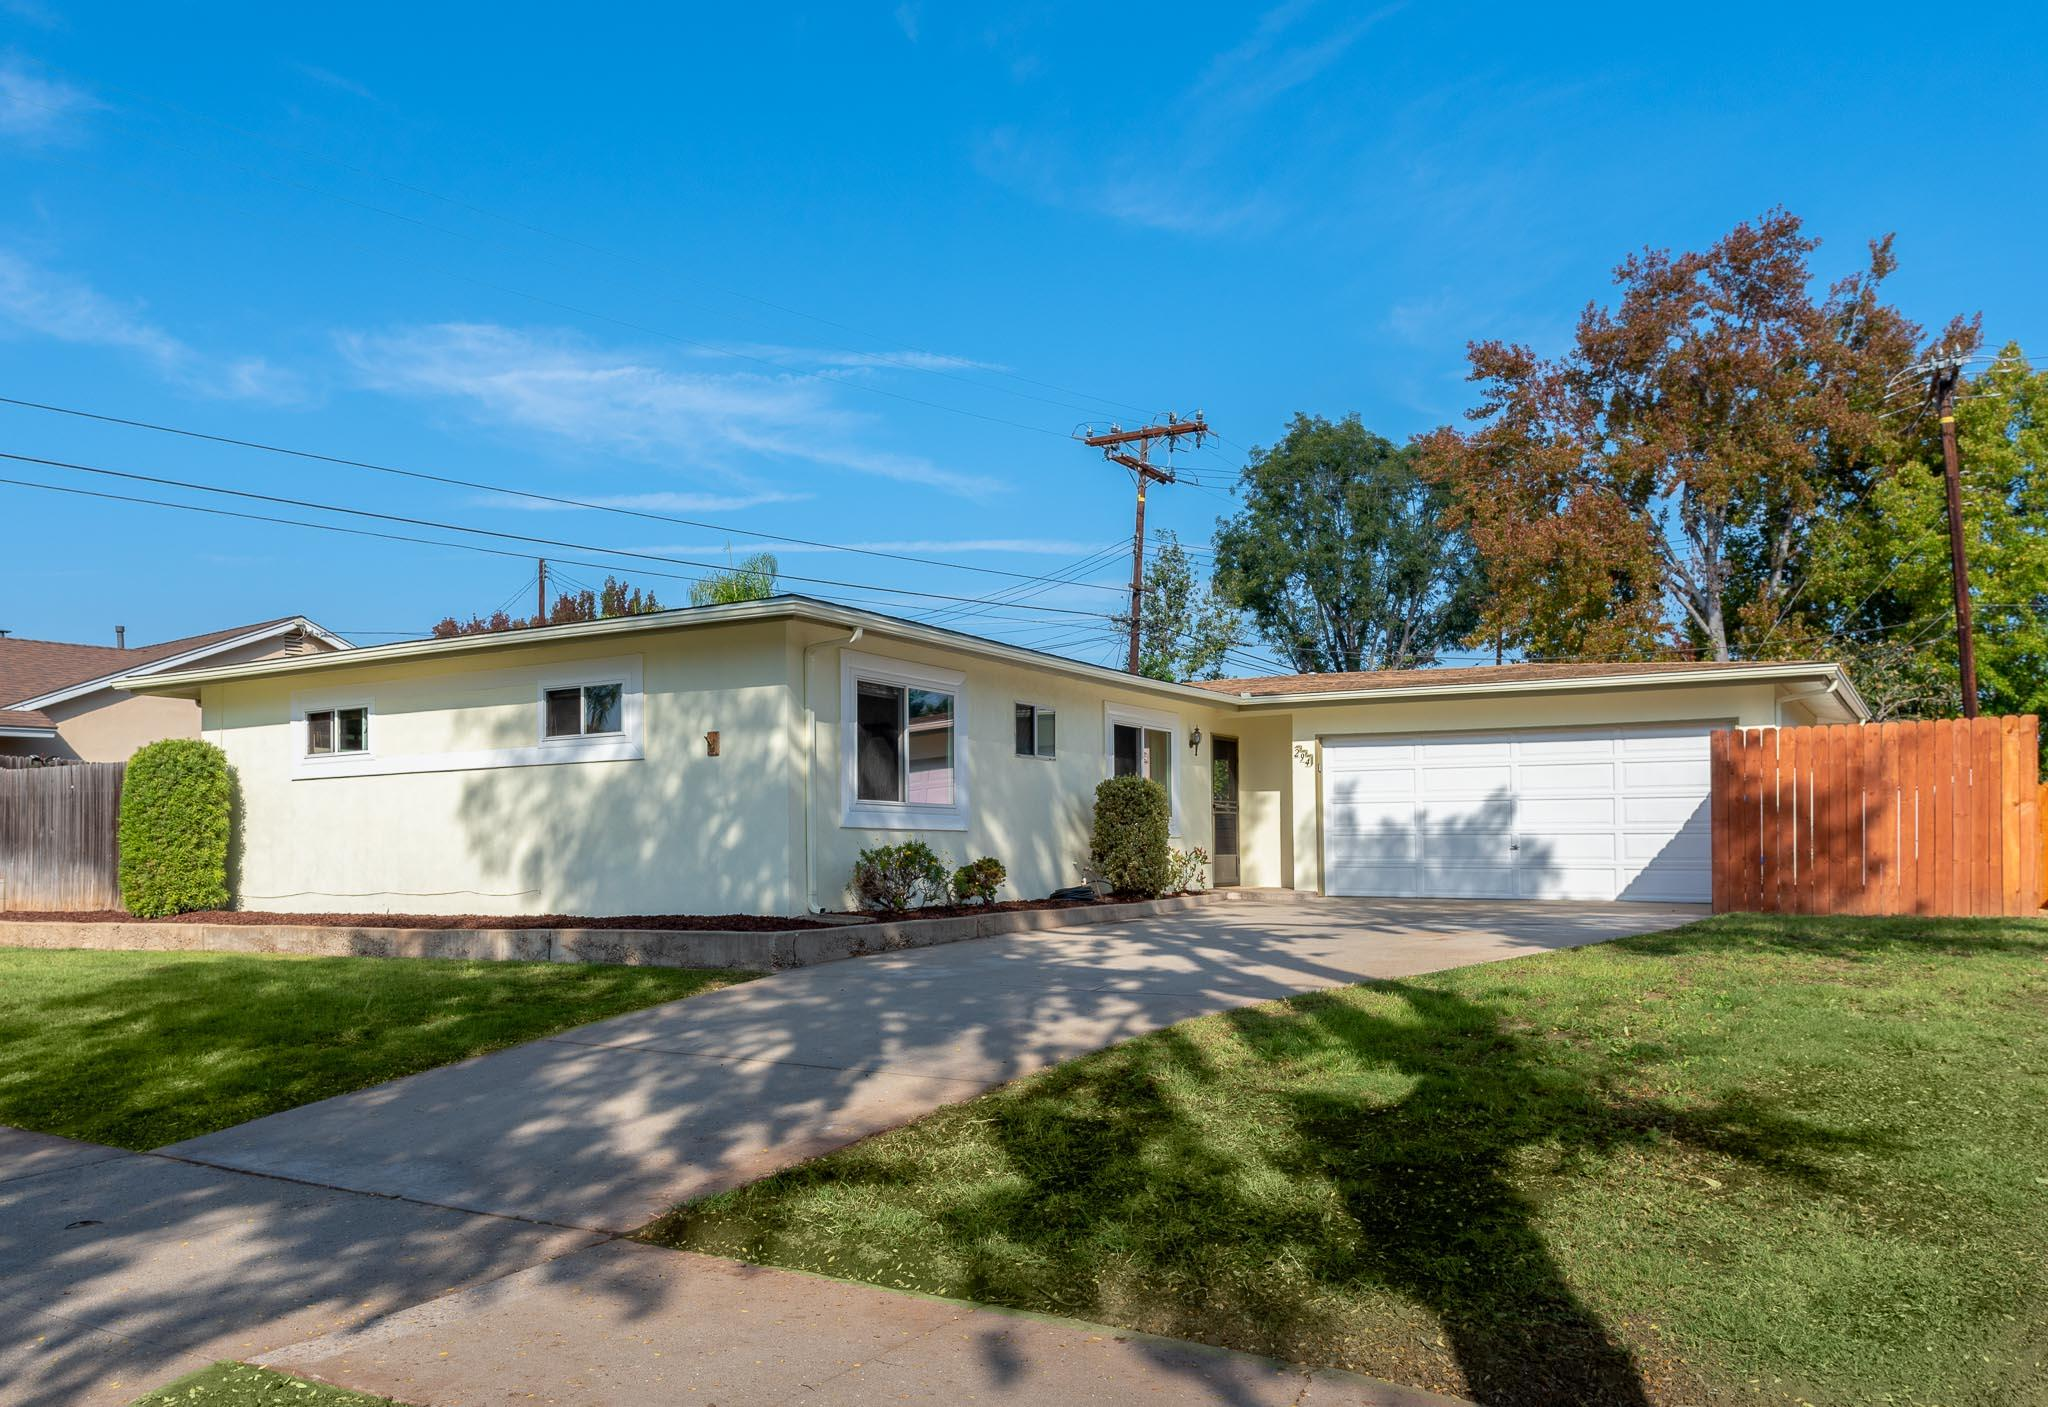 Property photo for 294 Carlo Dr Goleta, California 93117 - 18-3854